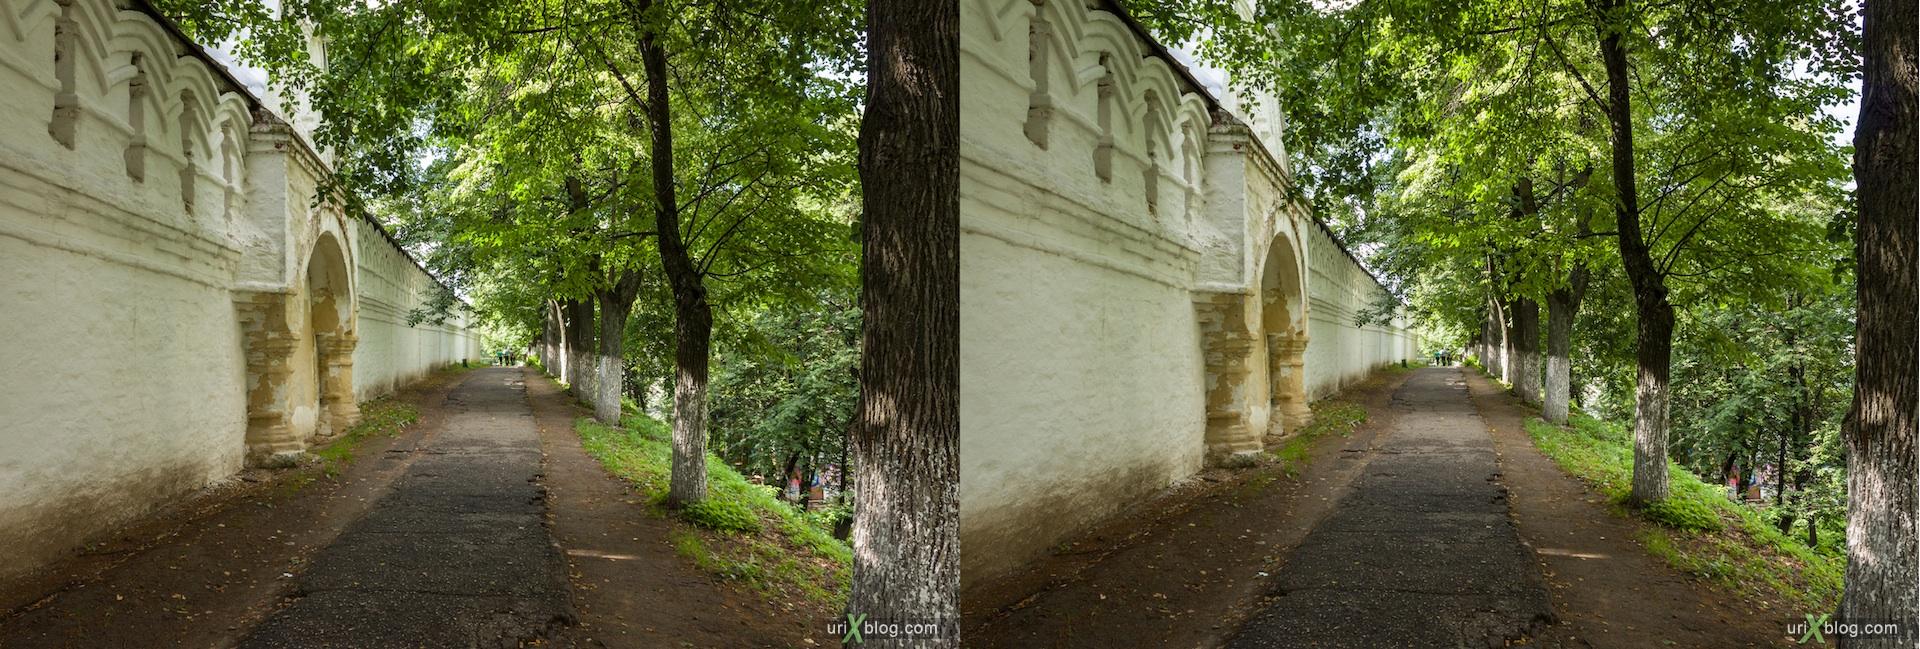 2012 3D stereo stereo pair 3Д стерео церковь храм монастырь владимир, Church Vladimir